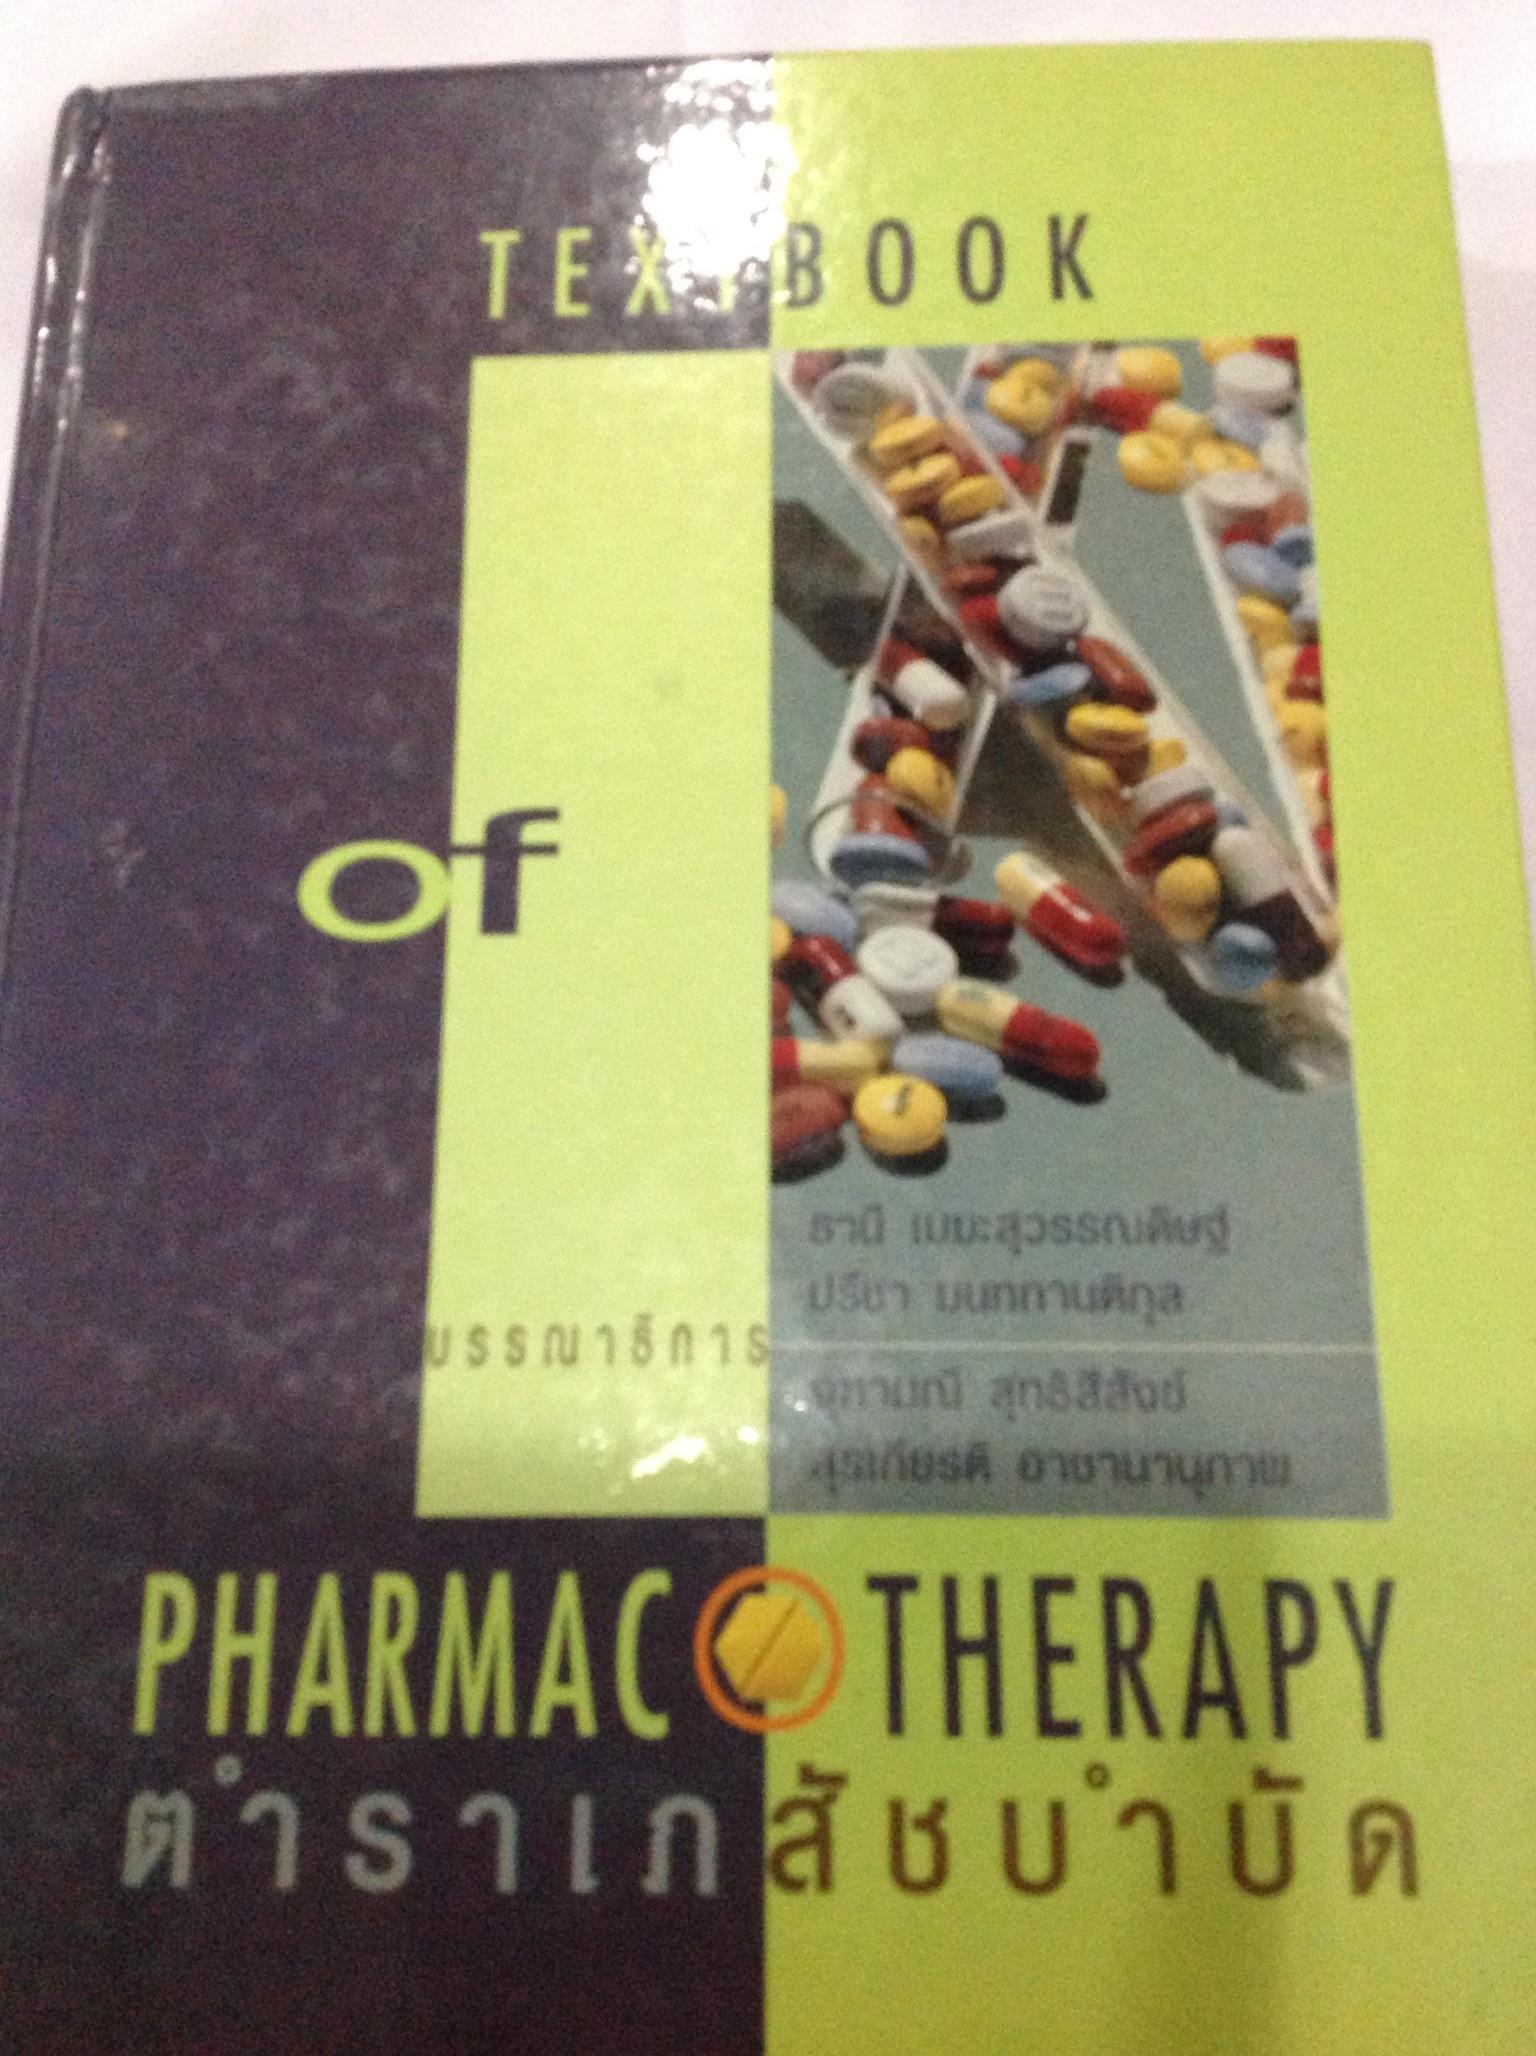 TEXTBOOK Of Pharmacotherapy ตำราเภสัชบำบัด